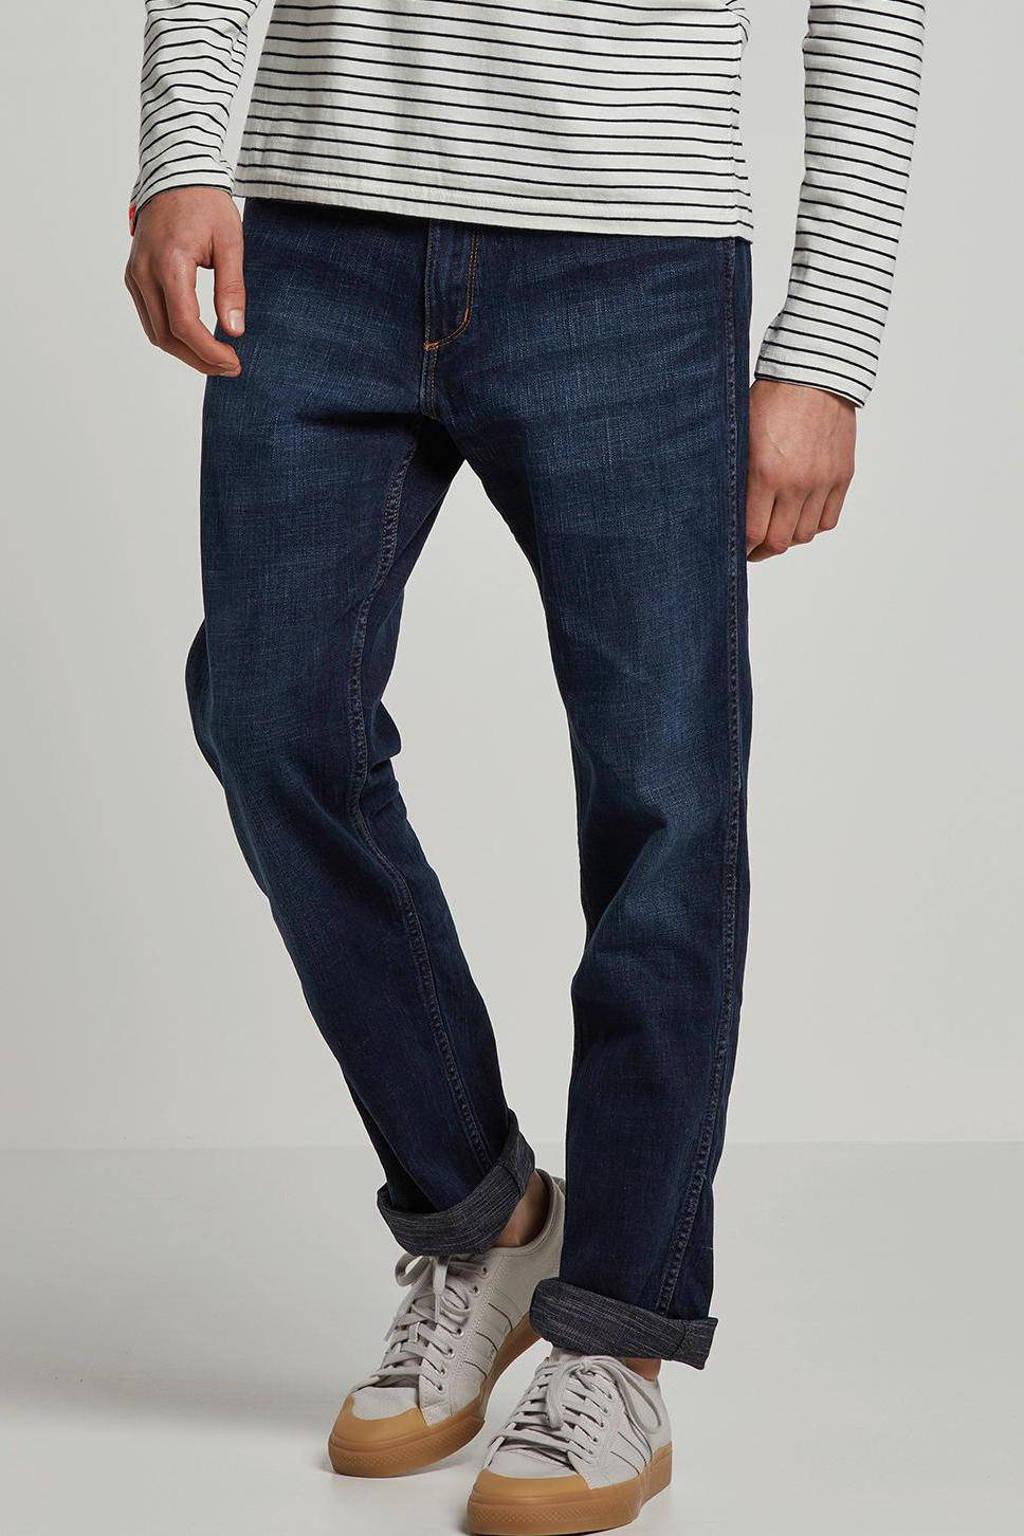 Wrangler straight fit jeans Greensboro el camino, El camino